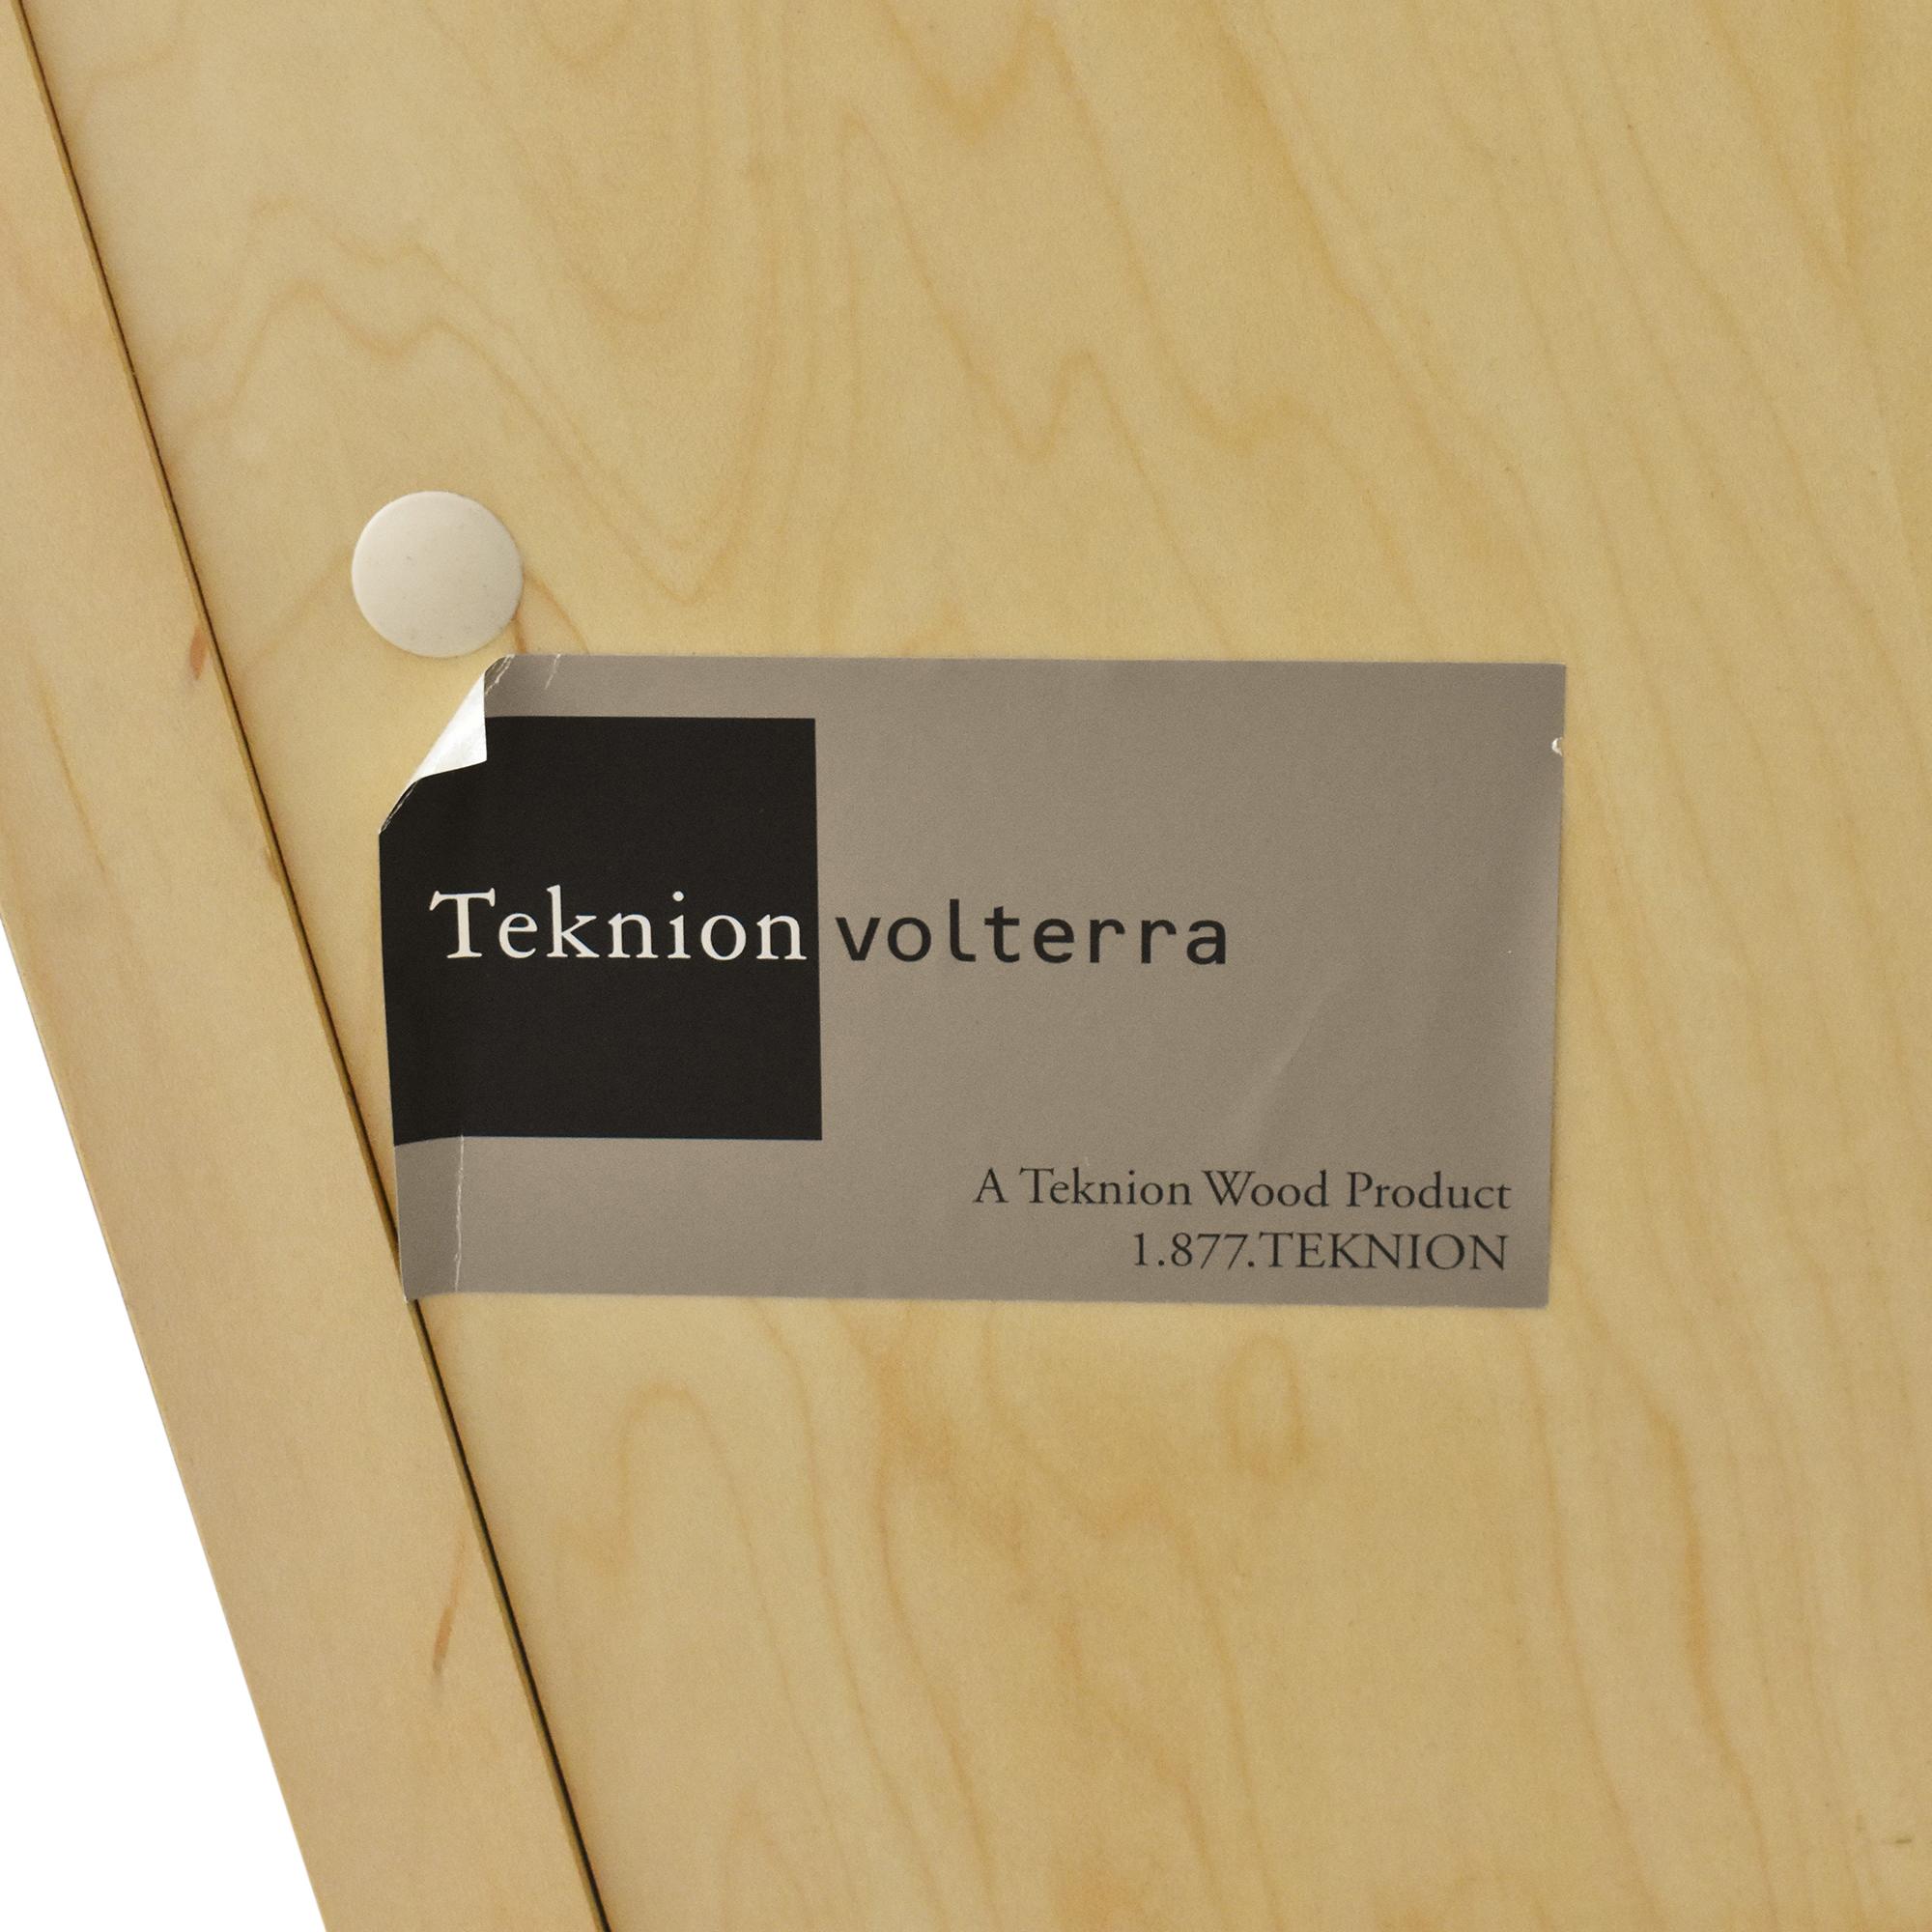 Teknion Teknion Volterra Bookcase nj